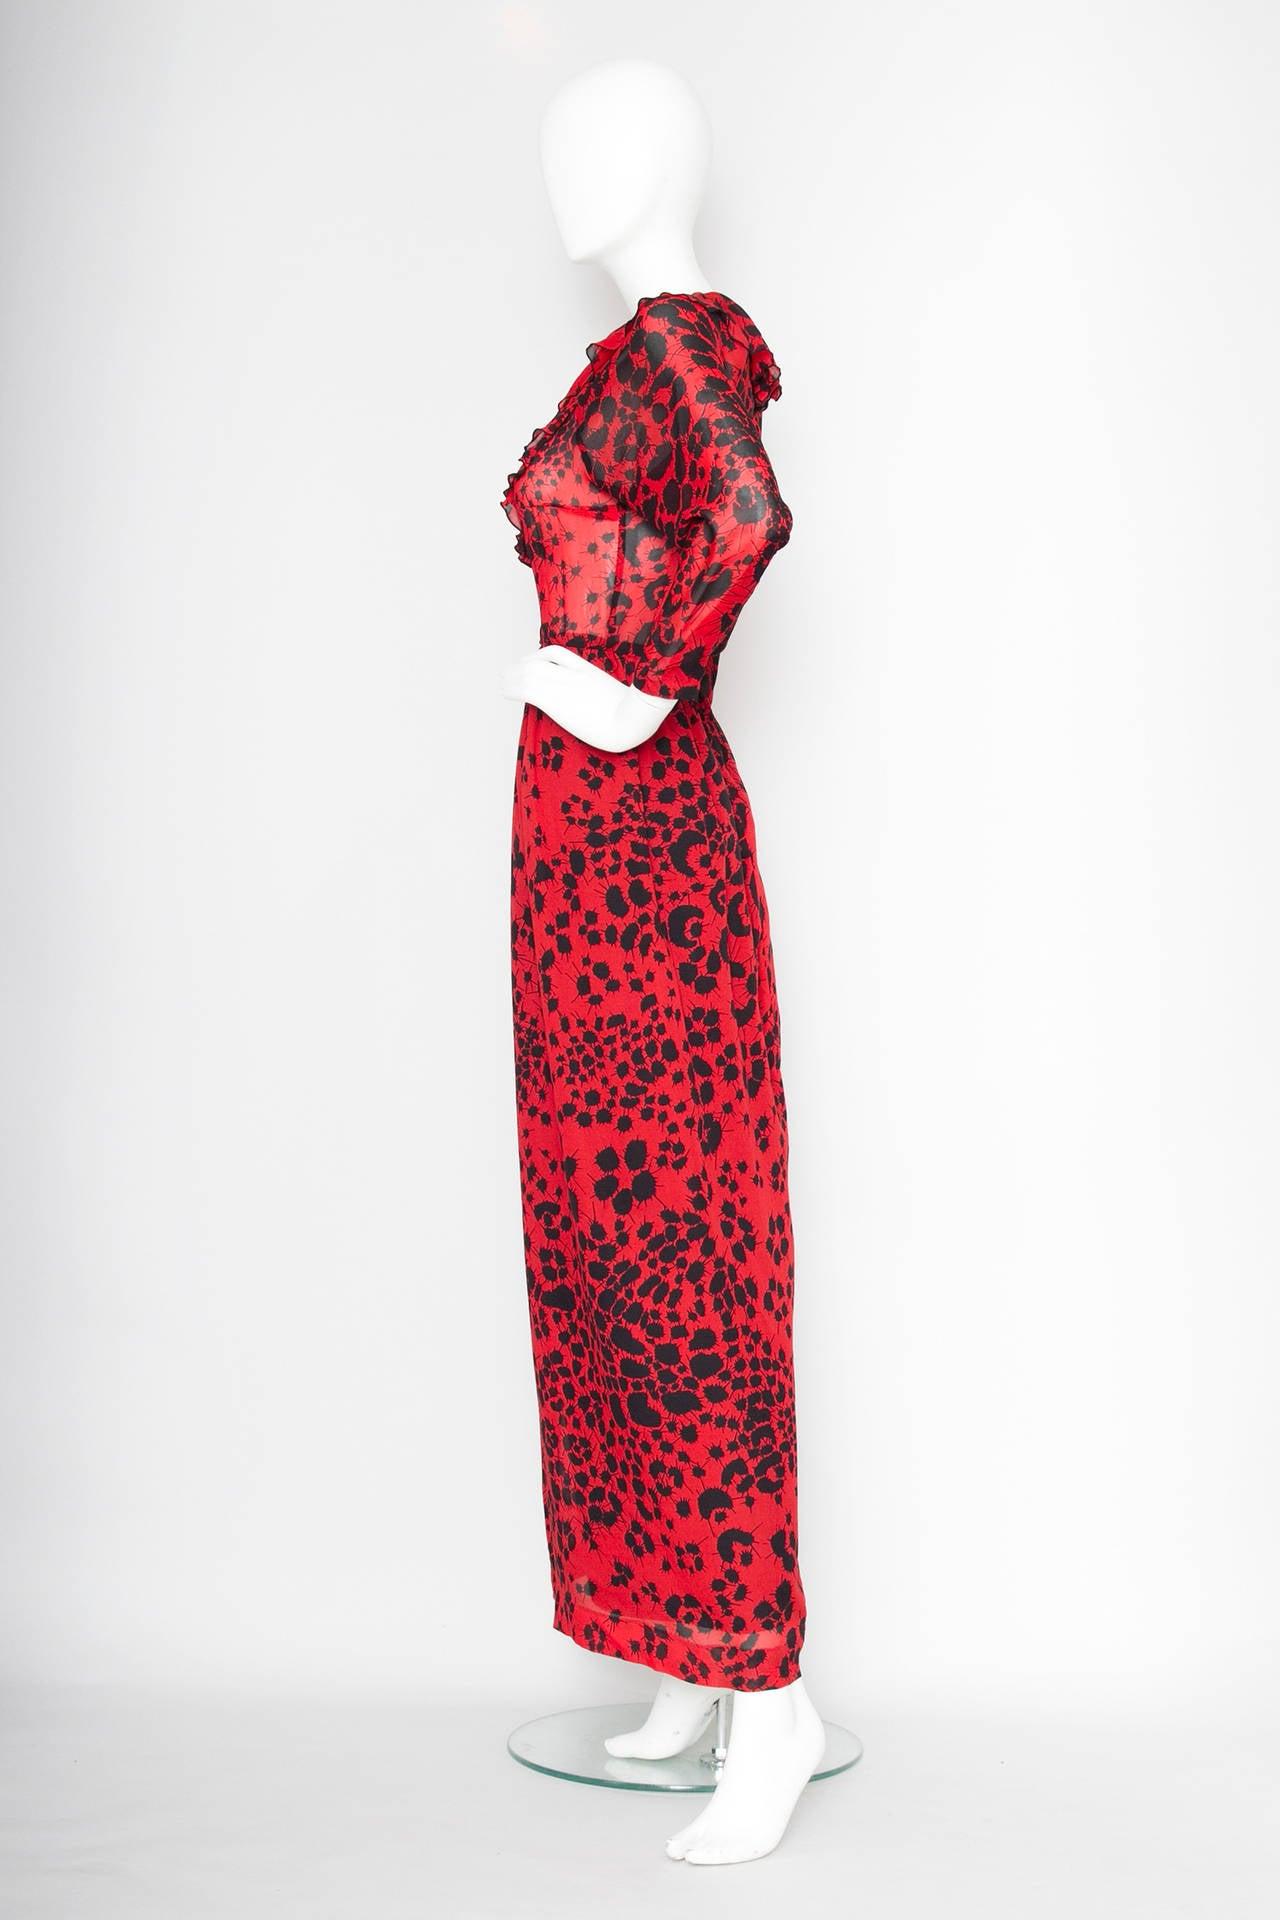 Dramatic 1970s Lanvin Red Silk Dress In Excellent Condition For Sale In Copenhagen, DK